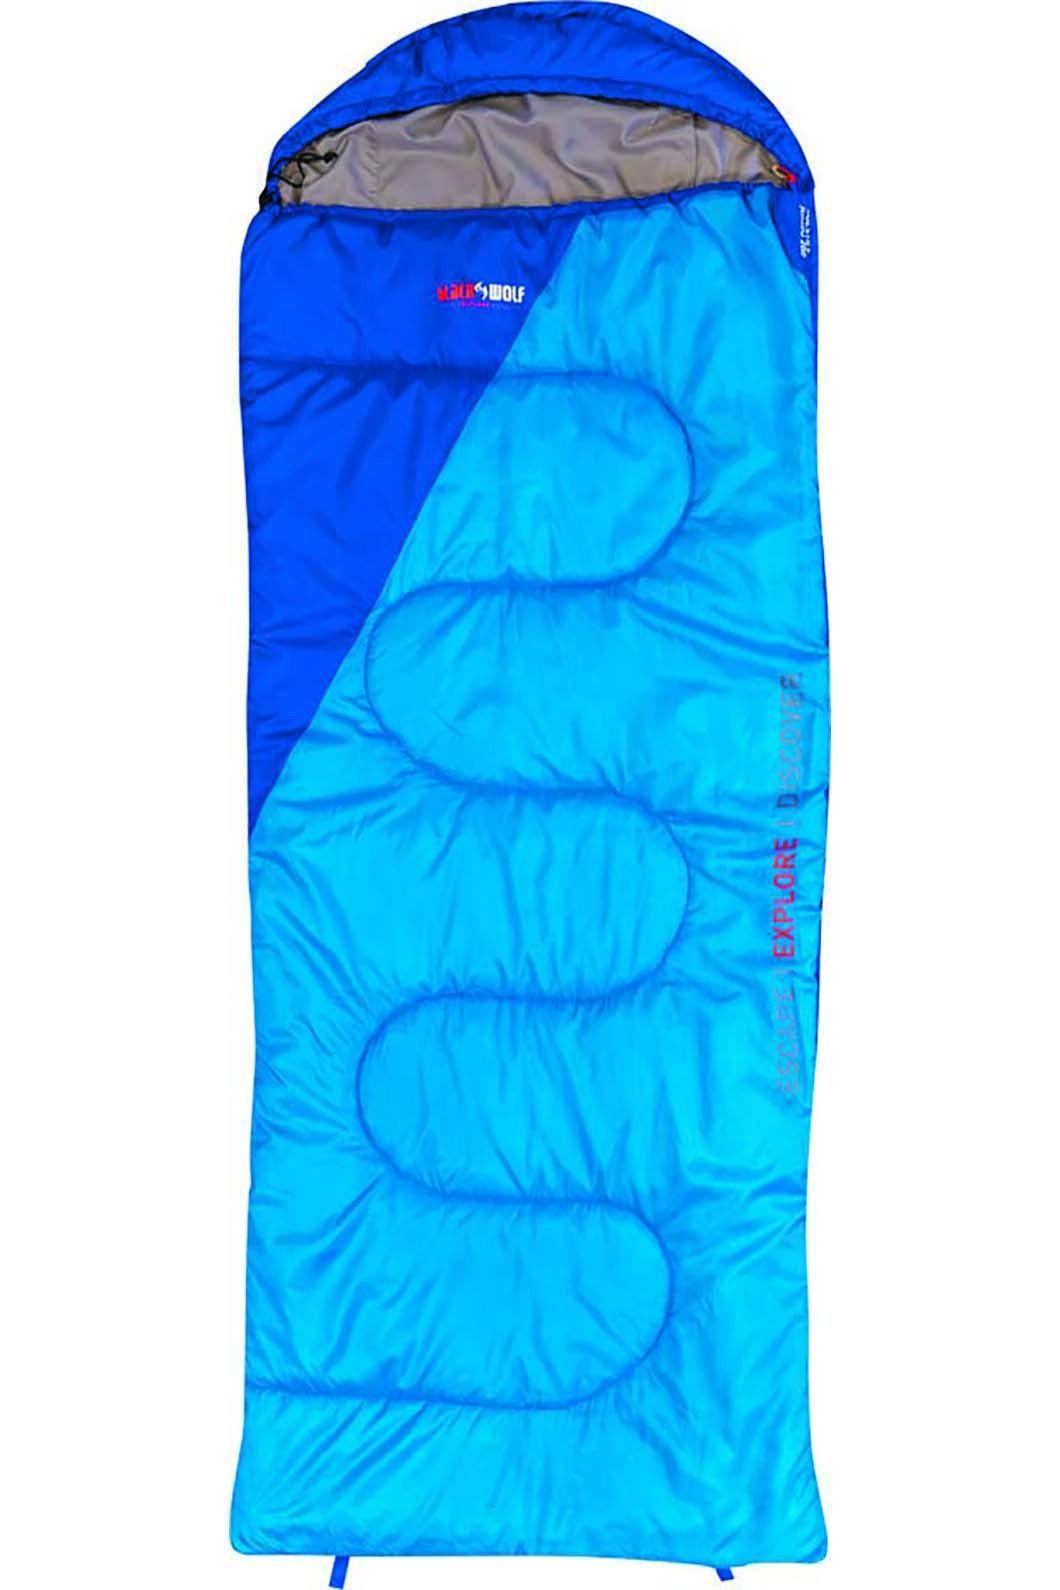 BlackWolf Solstice Jumbo 300 Sleeping Bag 6, None, hi-res